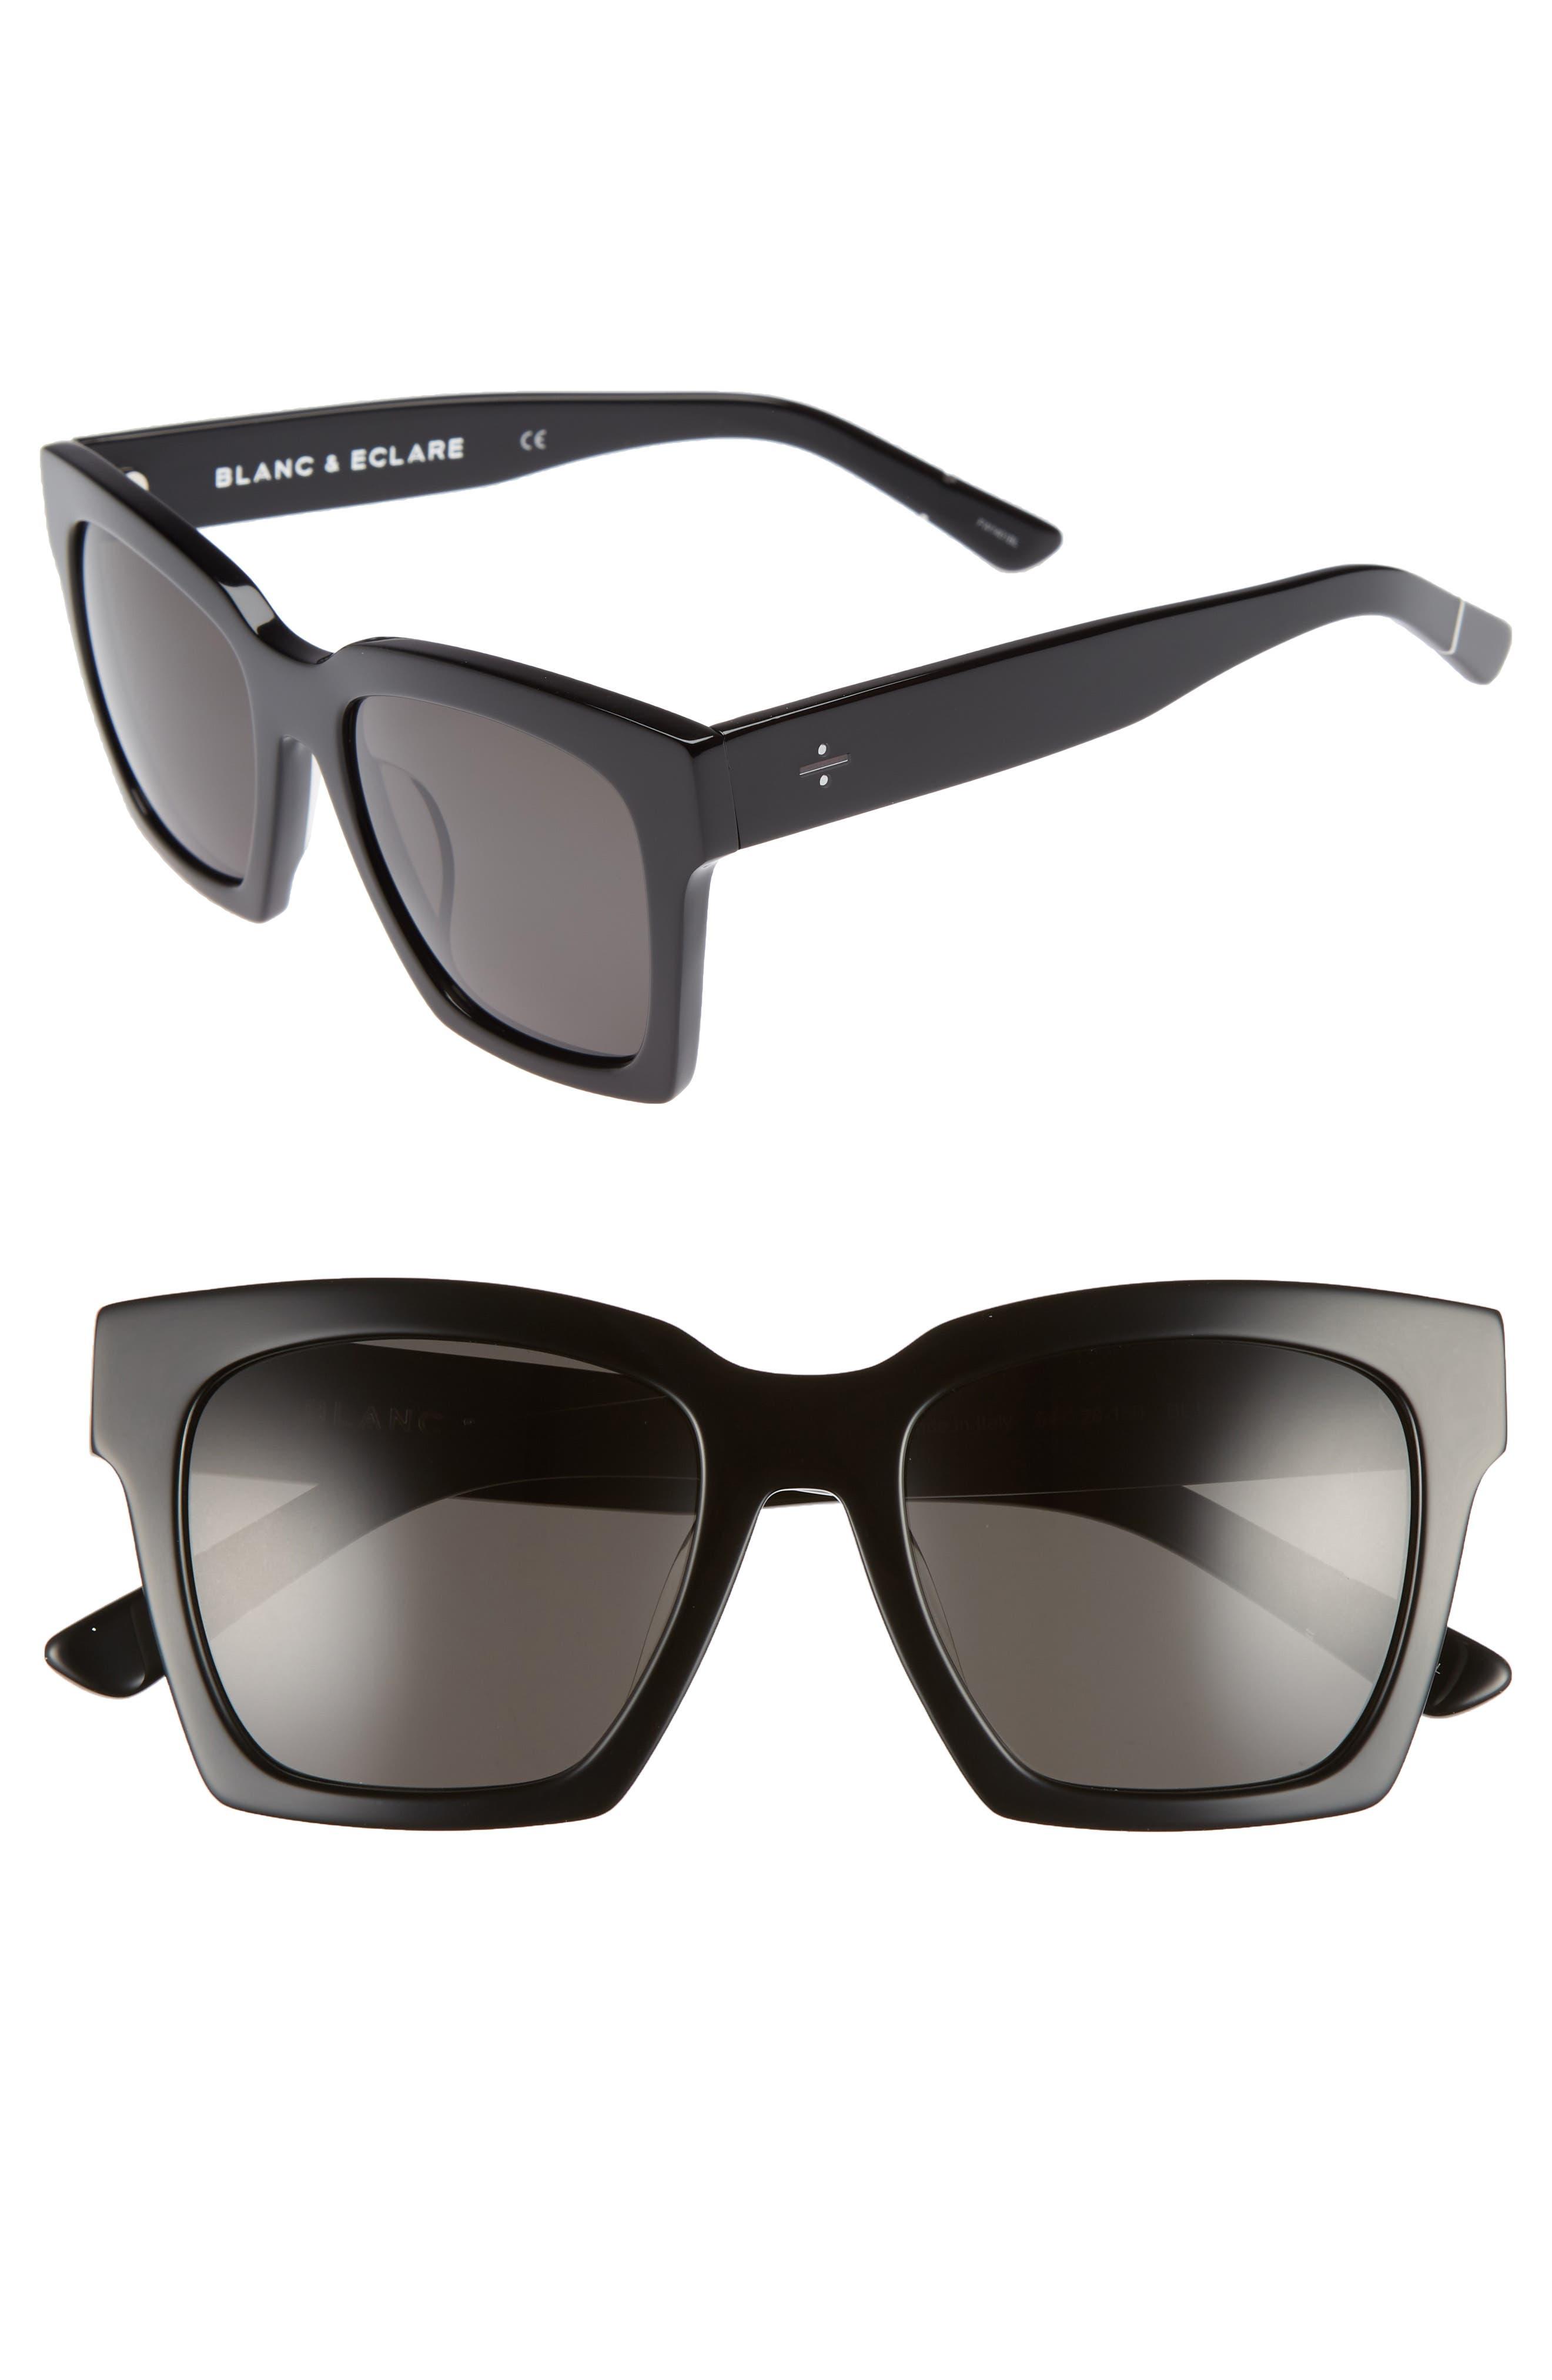 BLANC & ECLARE New York 54mm Polarized Sunglasses,                             Main thumbnail 1, color,                             BLACK